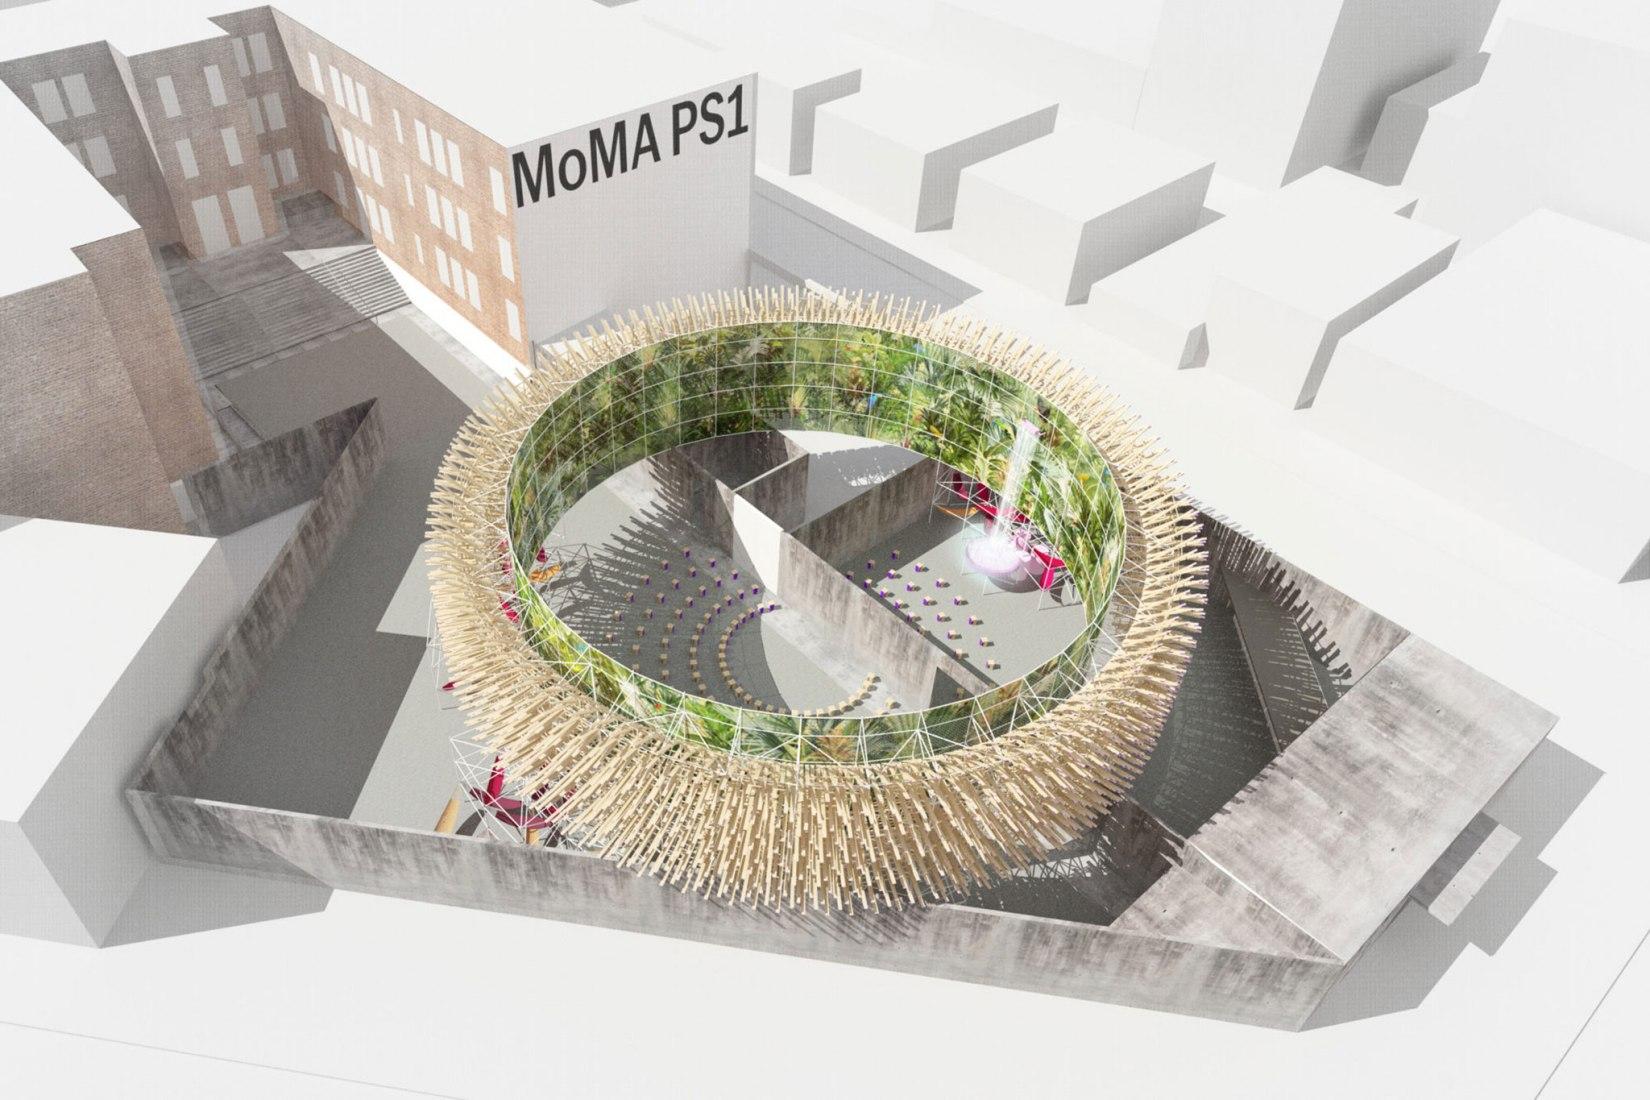 Rendering. Hórama Rama by Pedro & Juana. Winners of the Young Architects Program 2019, MoMA PS1, New York. Image Courtesy of Pedro & Juana.